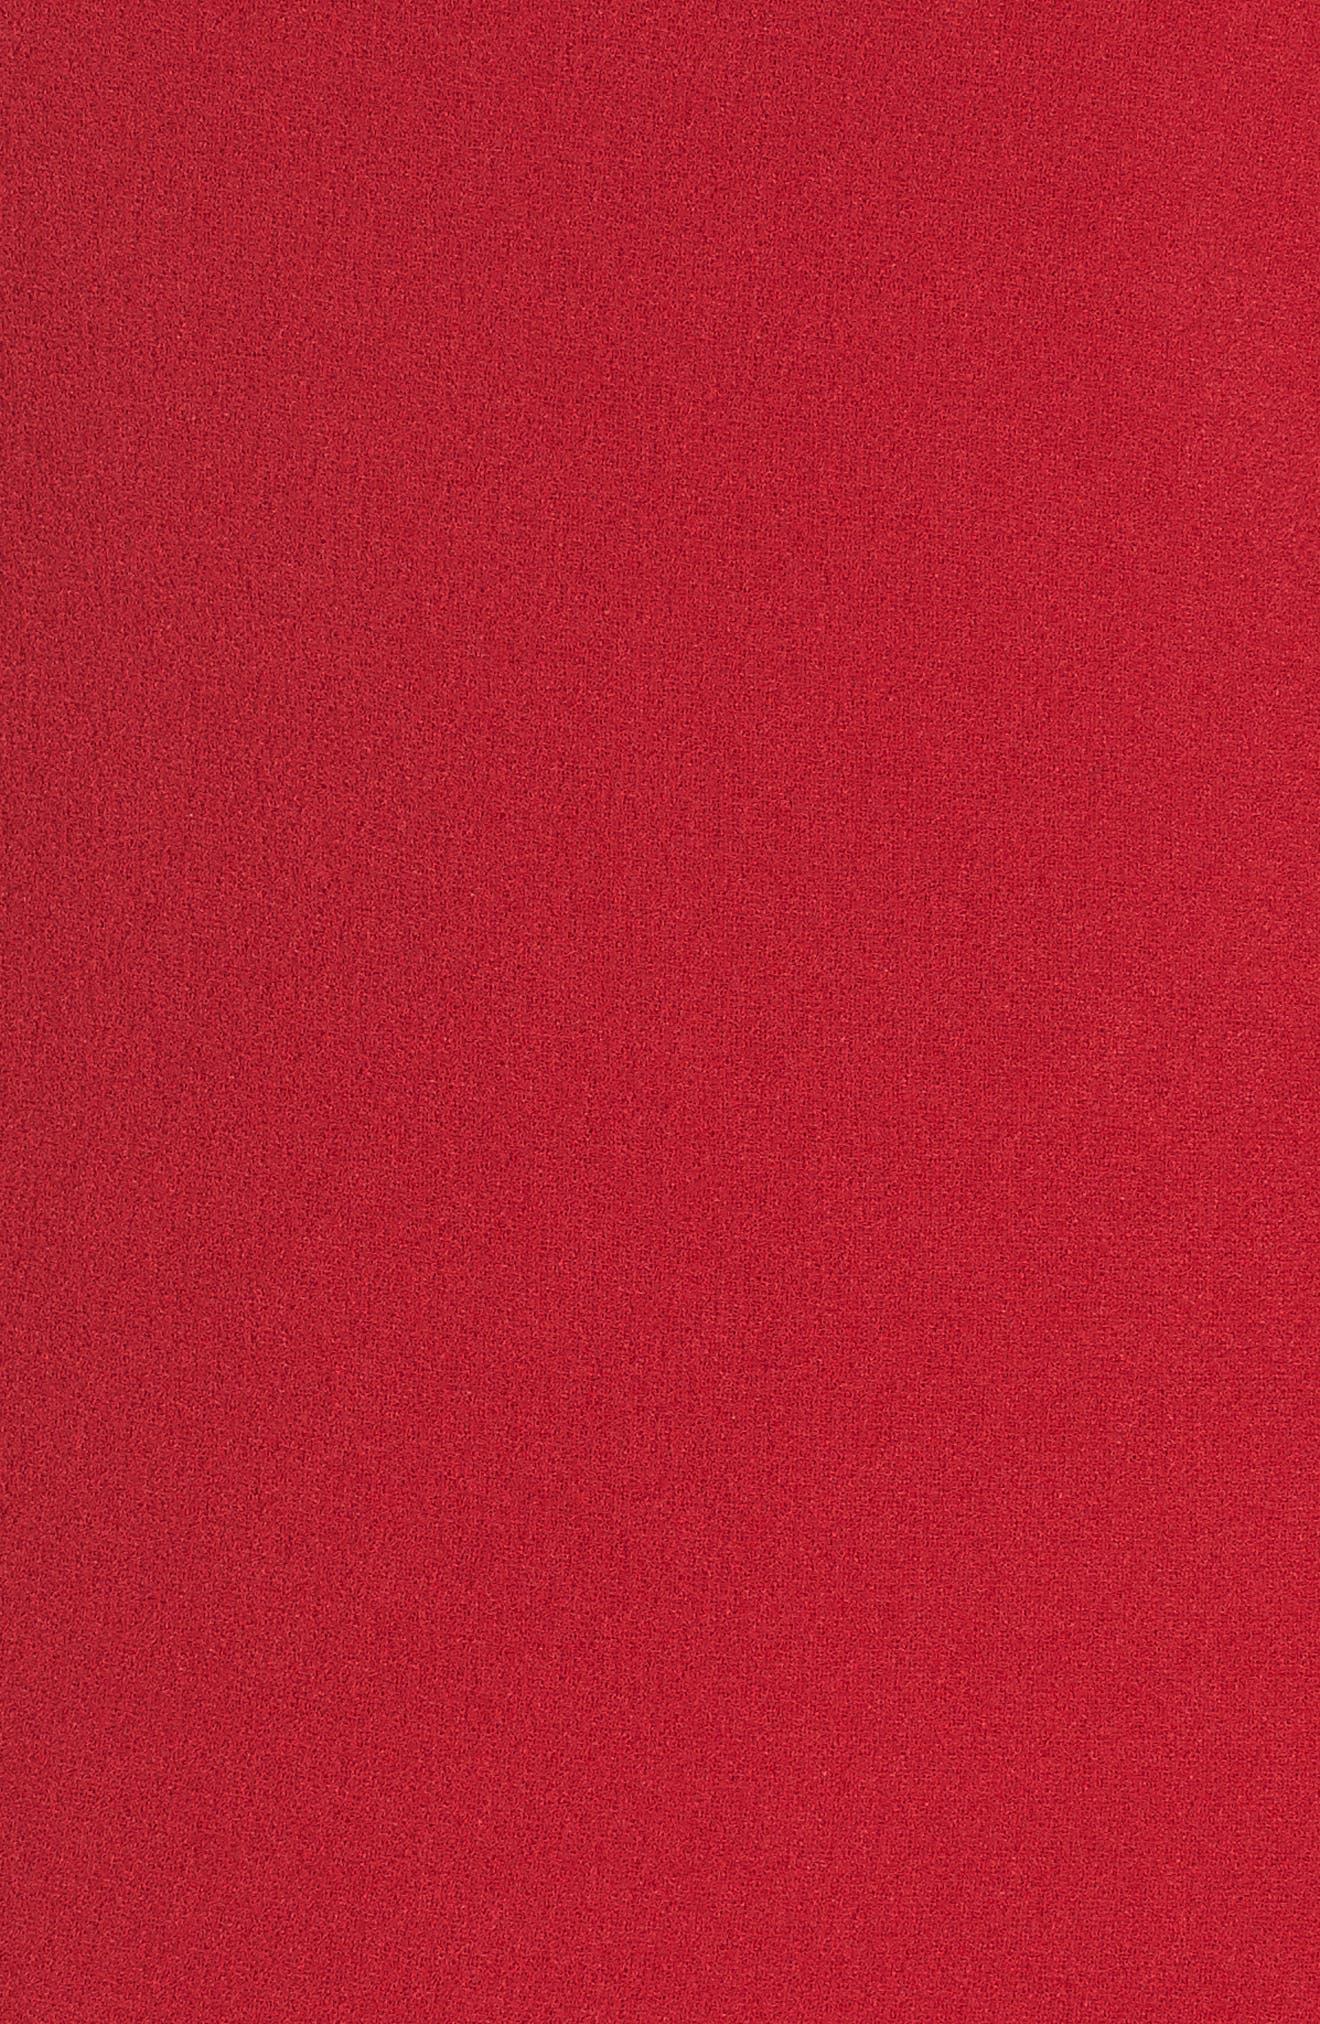 Asymmetrical Neck Fit & Flare Dress,                             Alternate thumbnail 6, color,                             GARNET